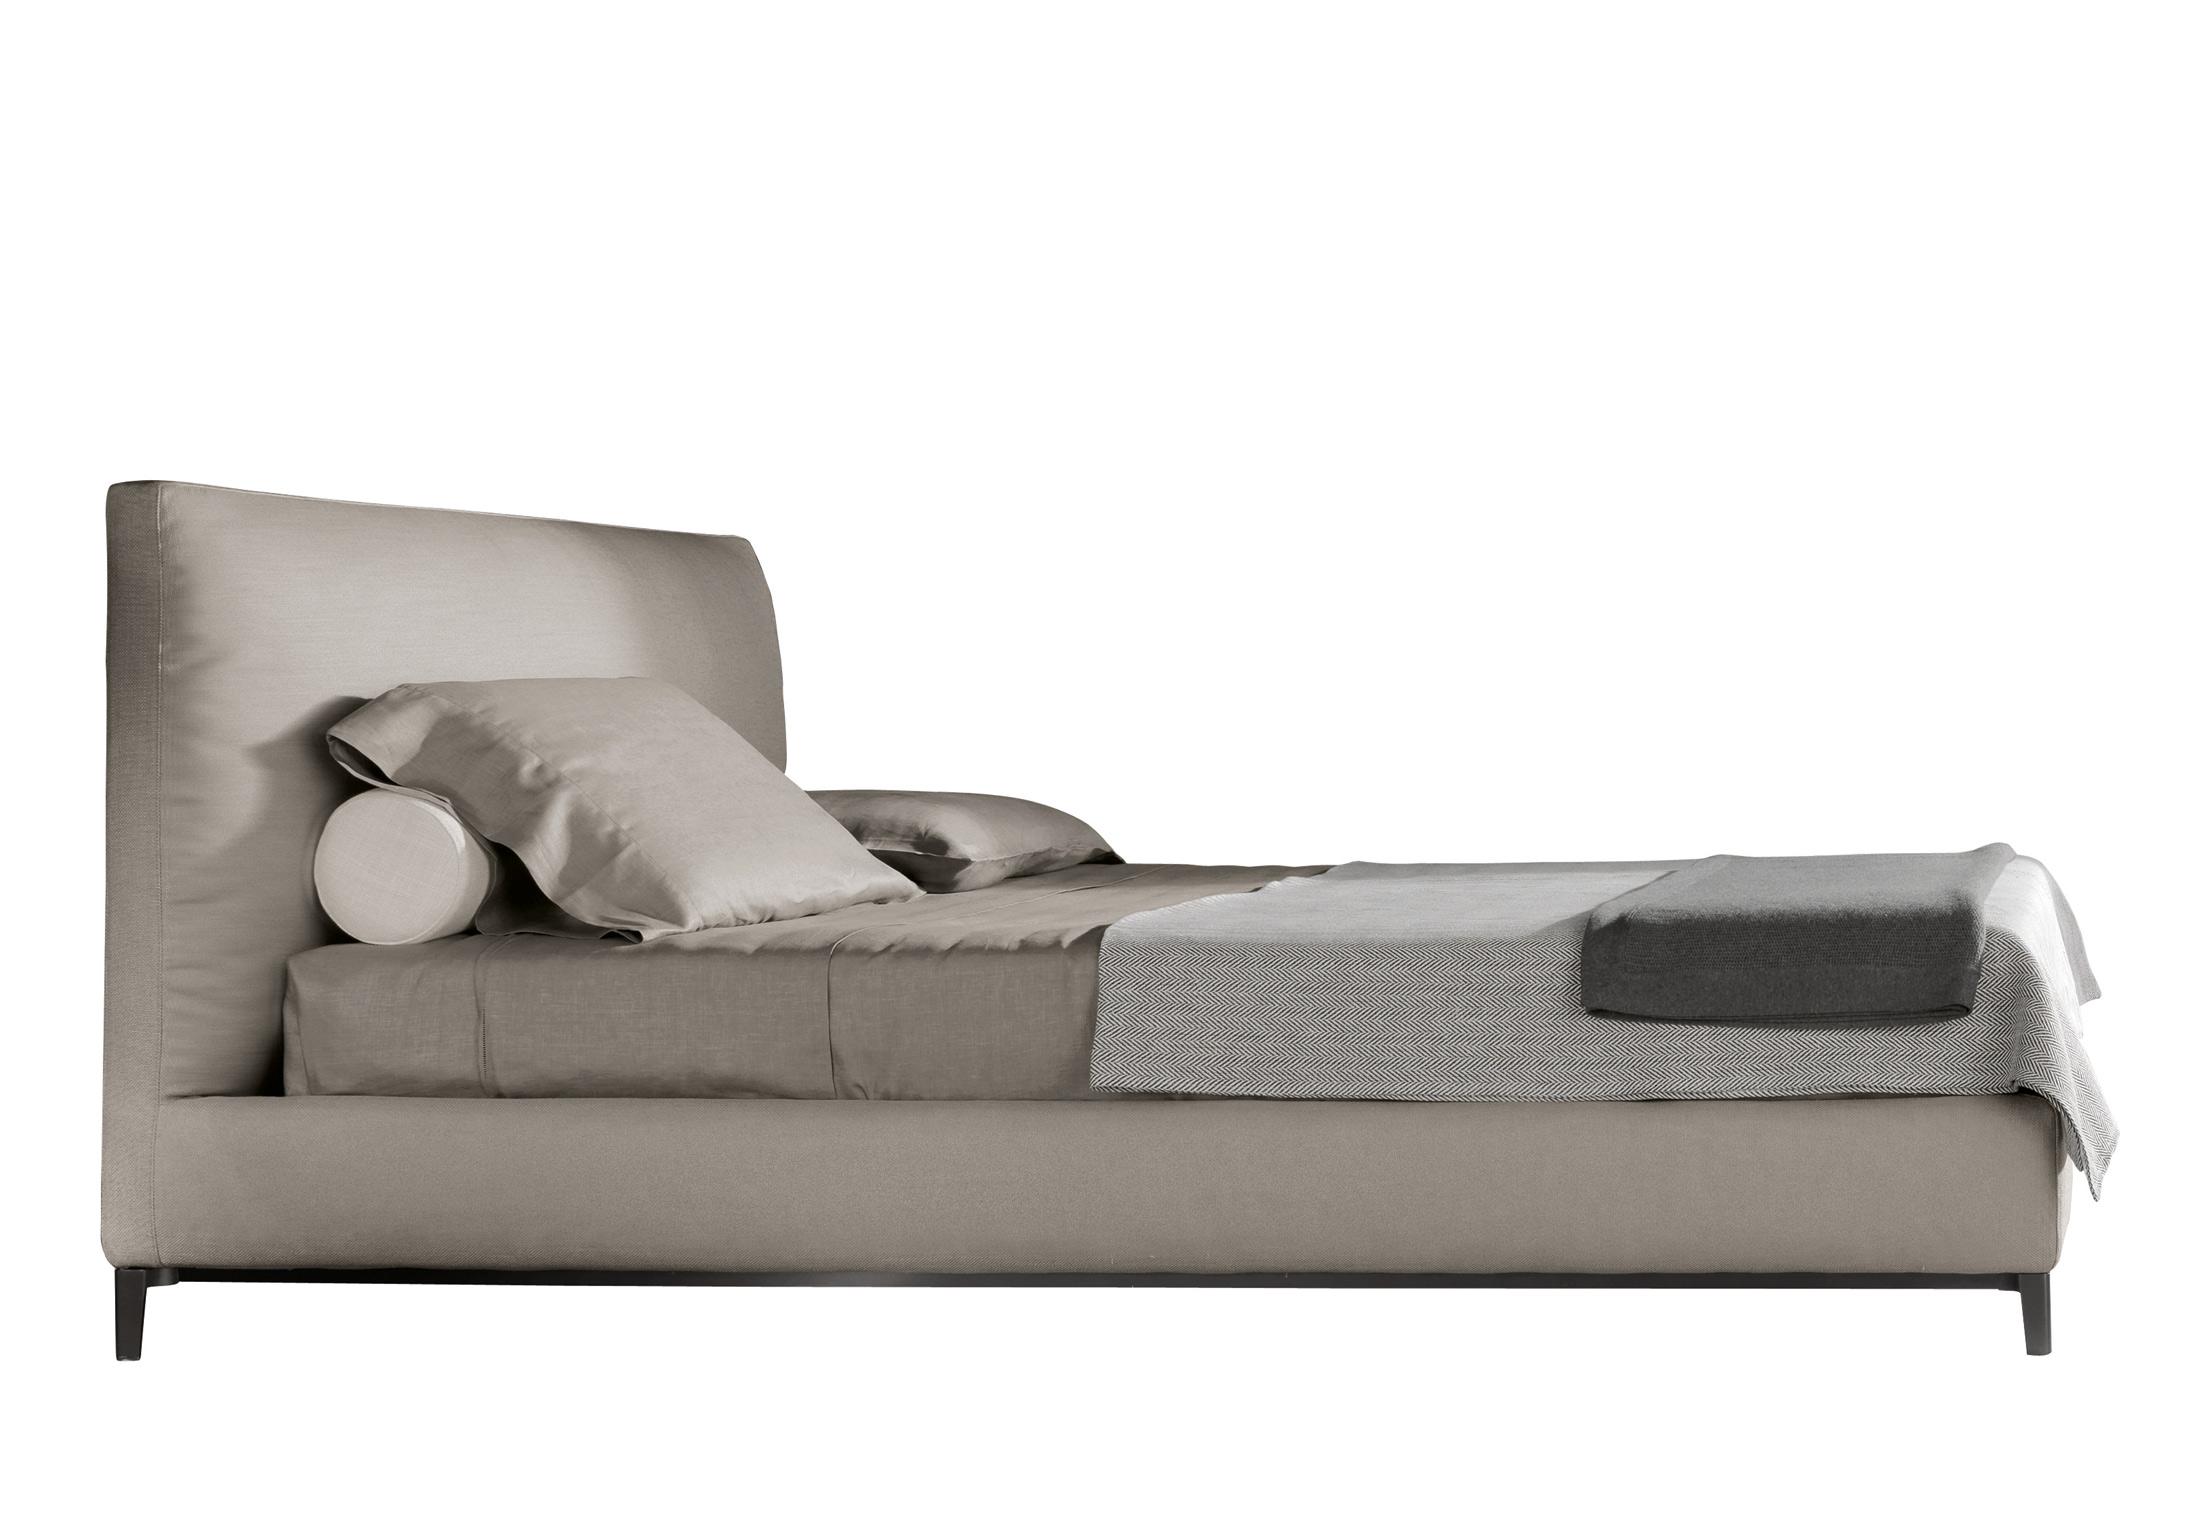 Andersen Bed By Minotti Stylepark